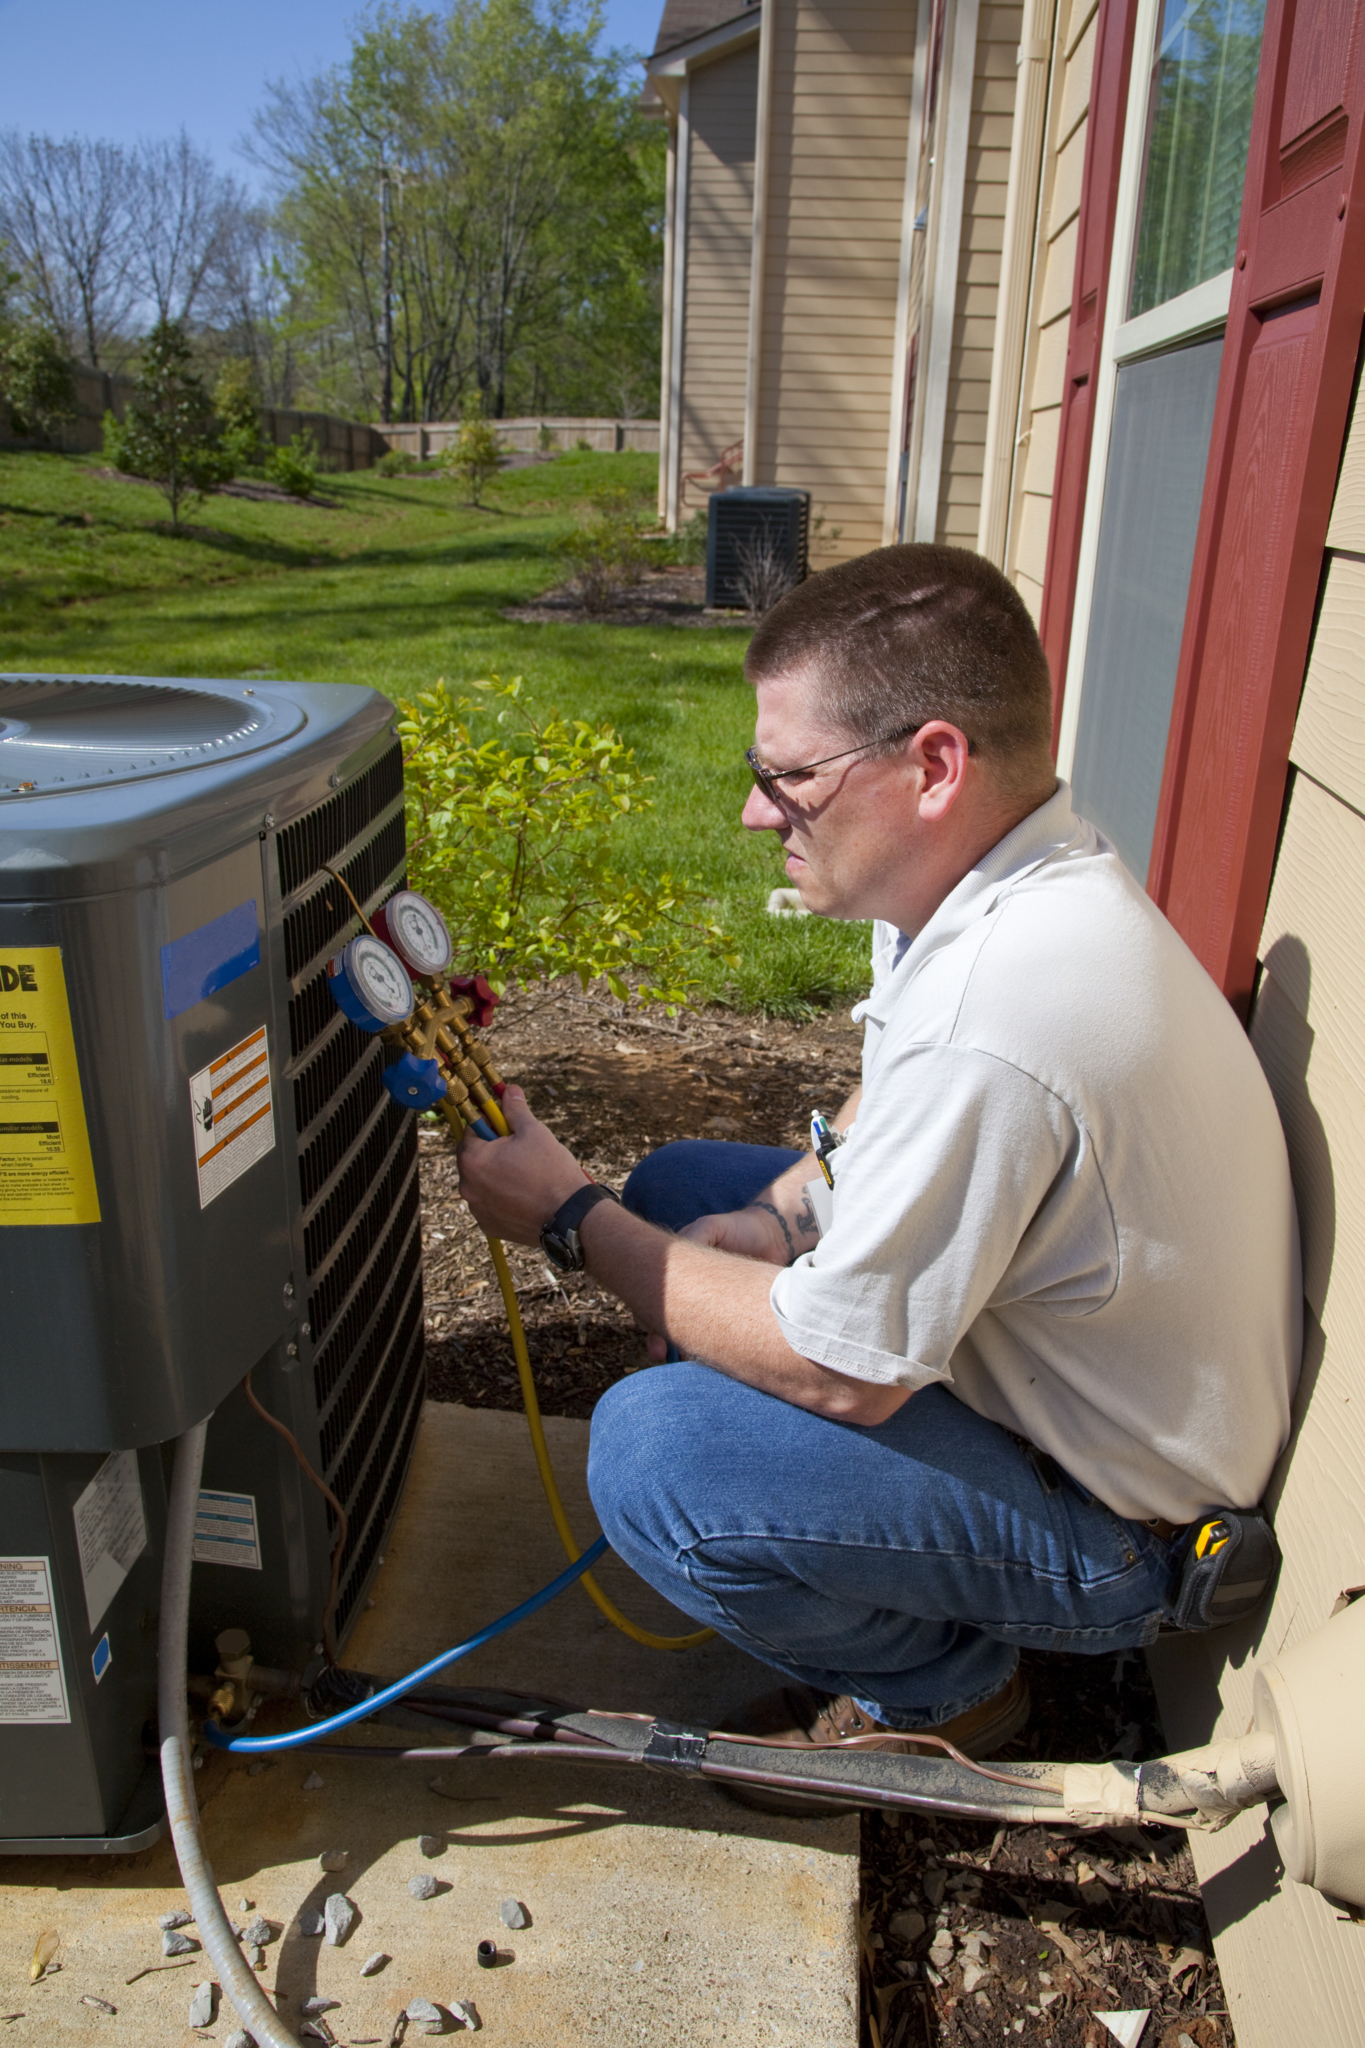 LSM-Lee's Sheet Metal Ltd in Grande Prairie: Air conditioning installation and repair.